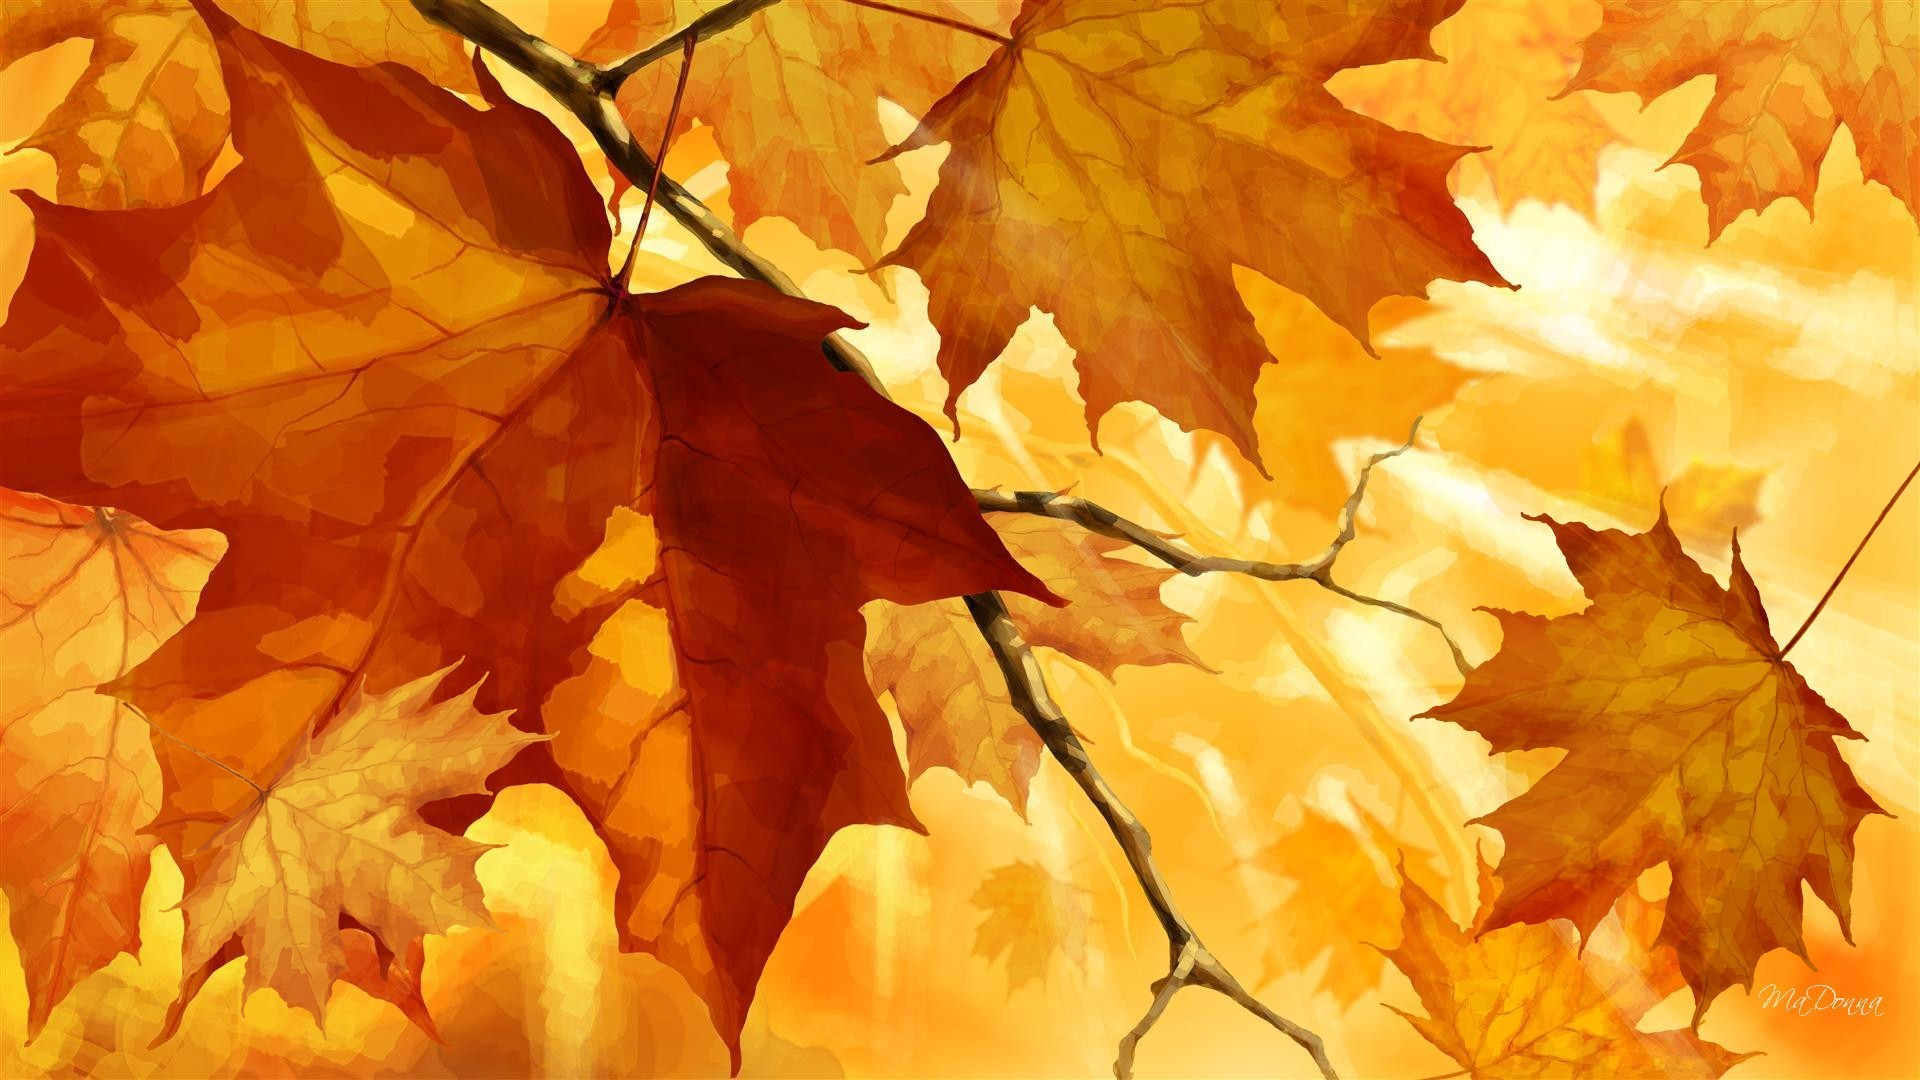 Season Tag – Light Autumn Firefox Orange Leaves Season Fall Change Persona  Color Nature Waterfall Wallpaper